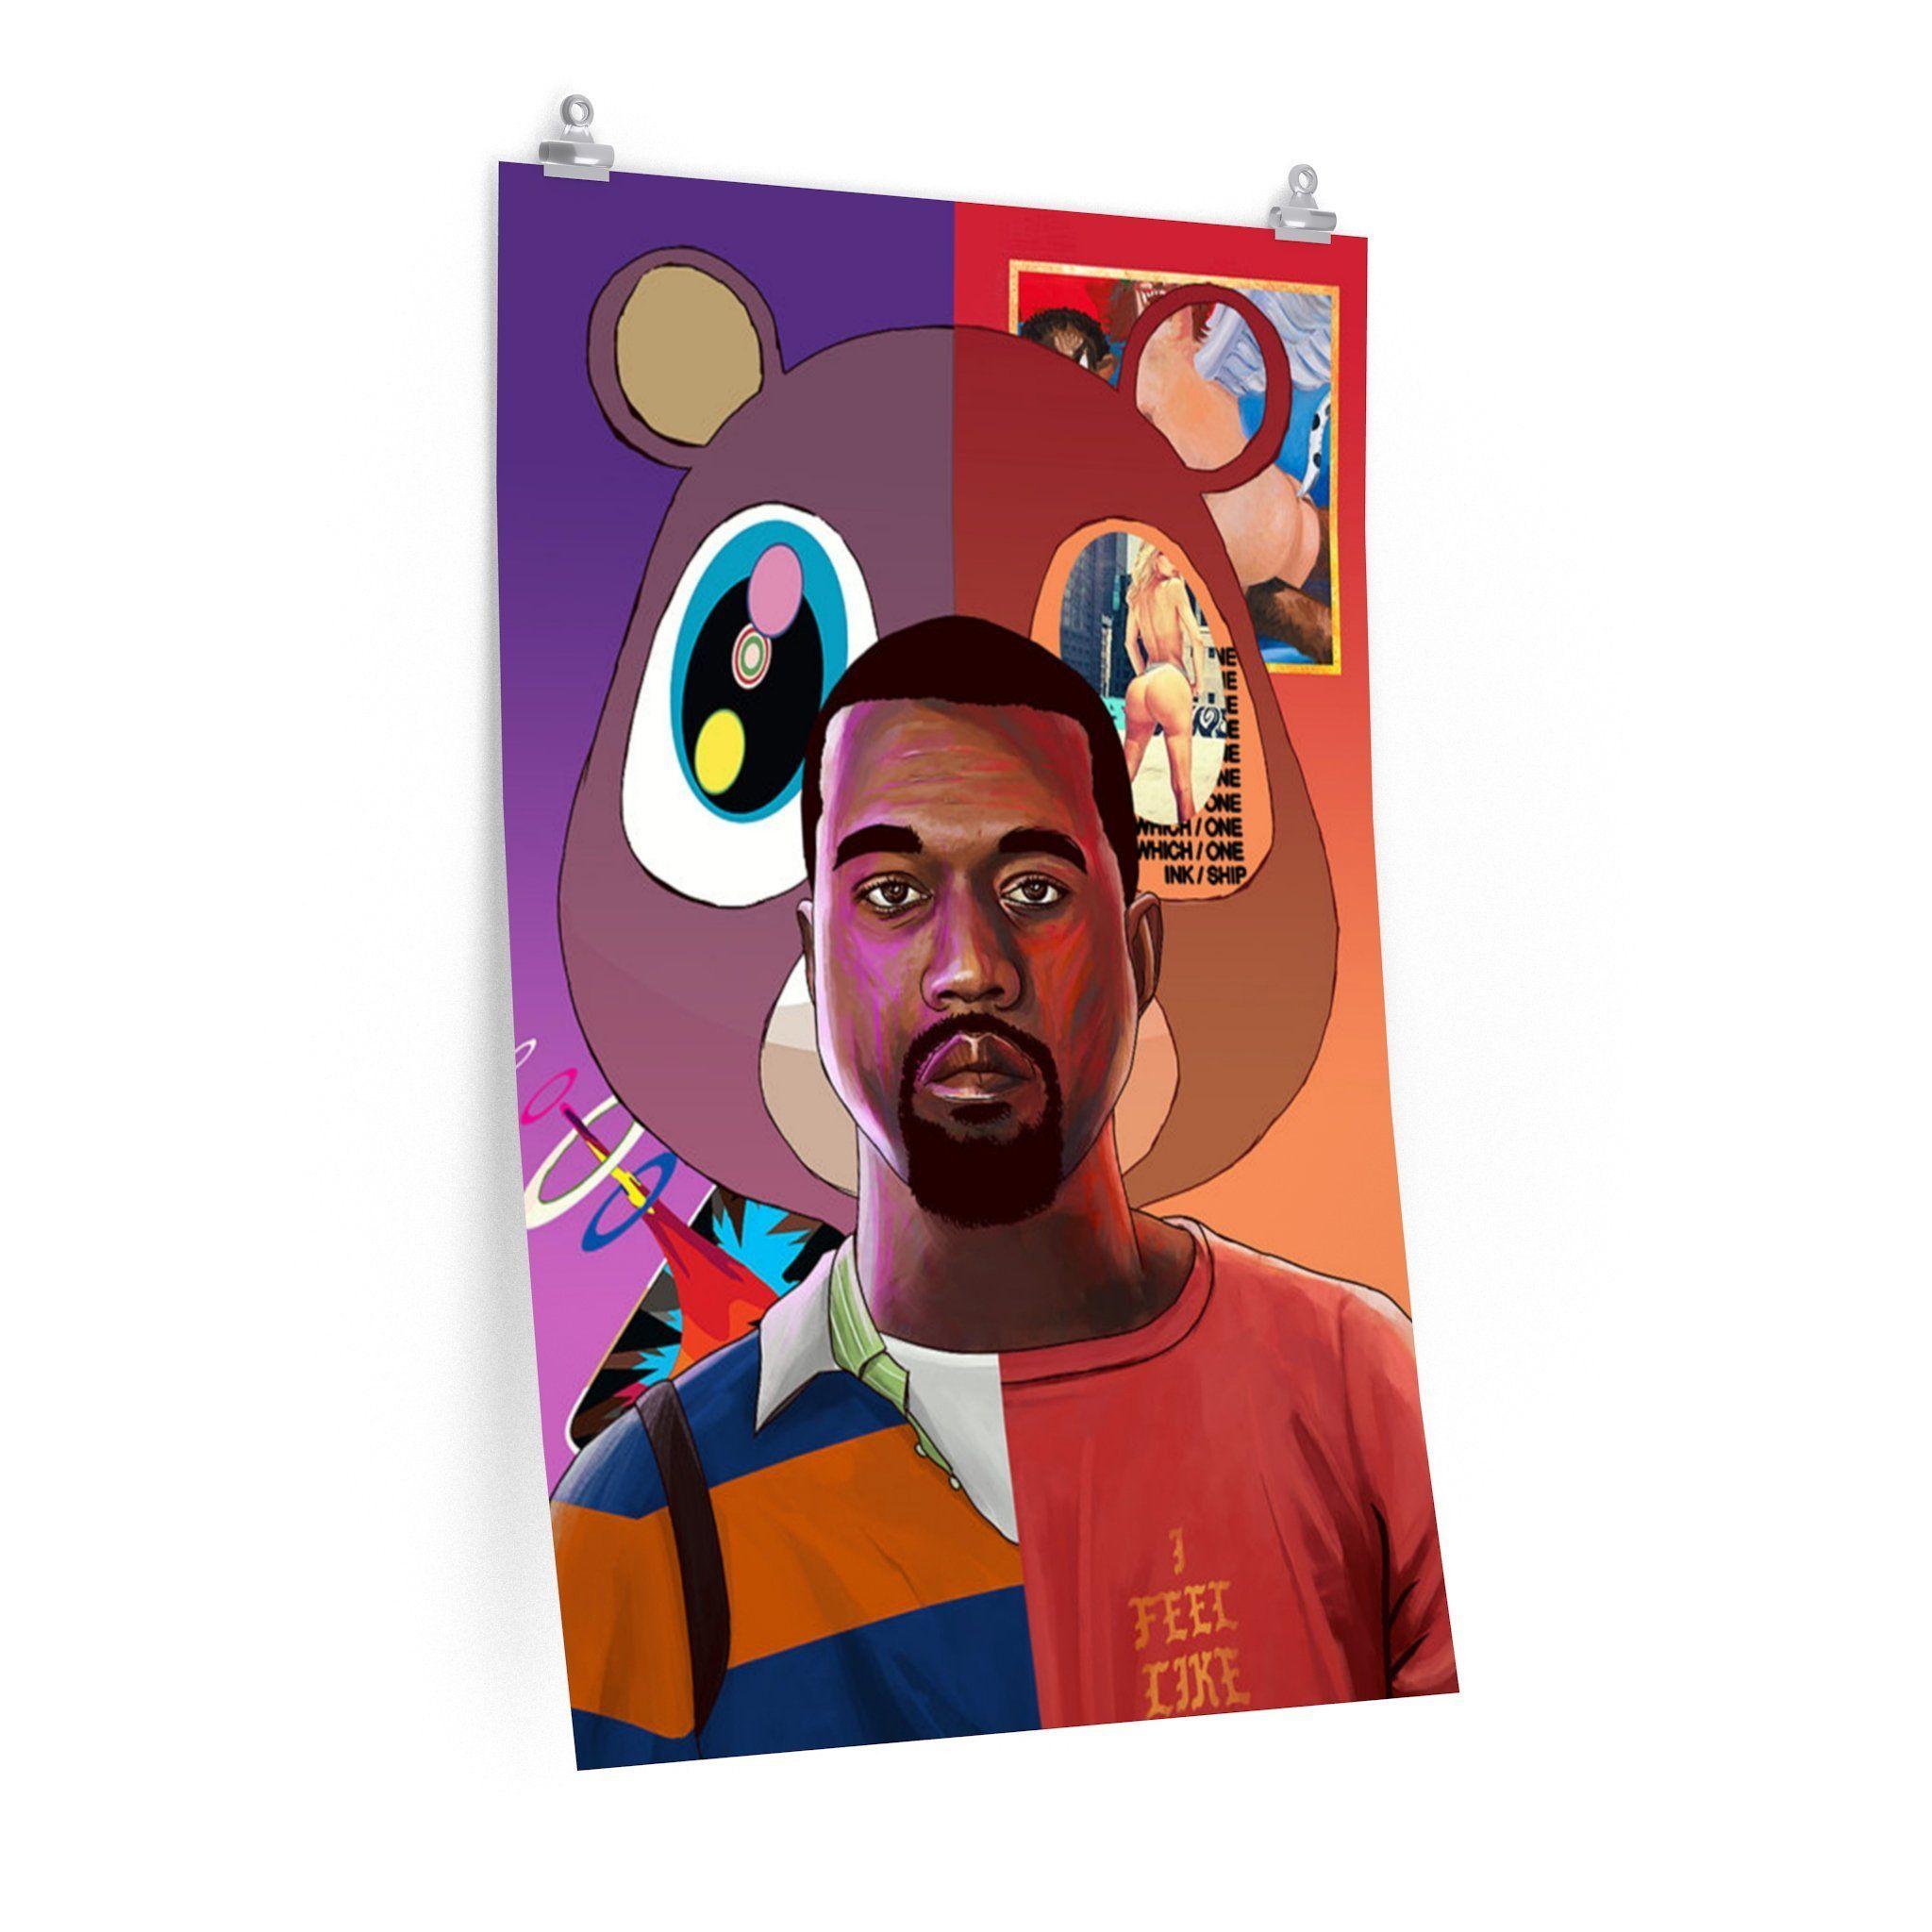 5278e4bd076fa Kanye West Poster | Products | Kanye west, Art, West art